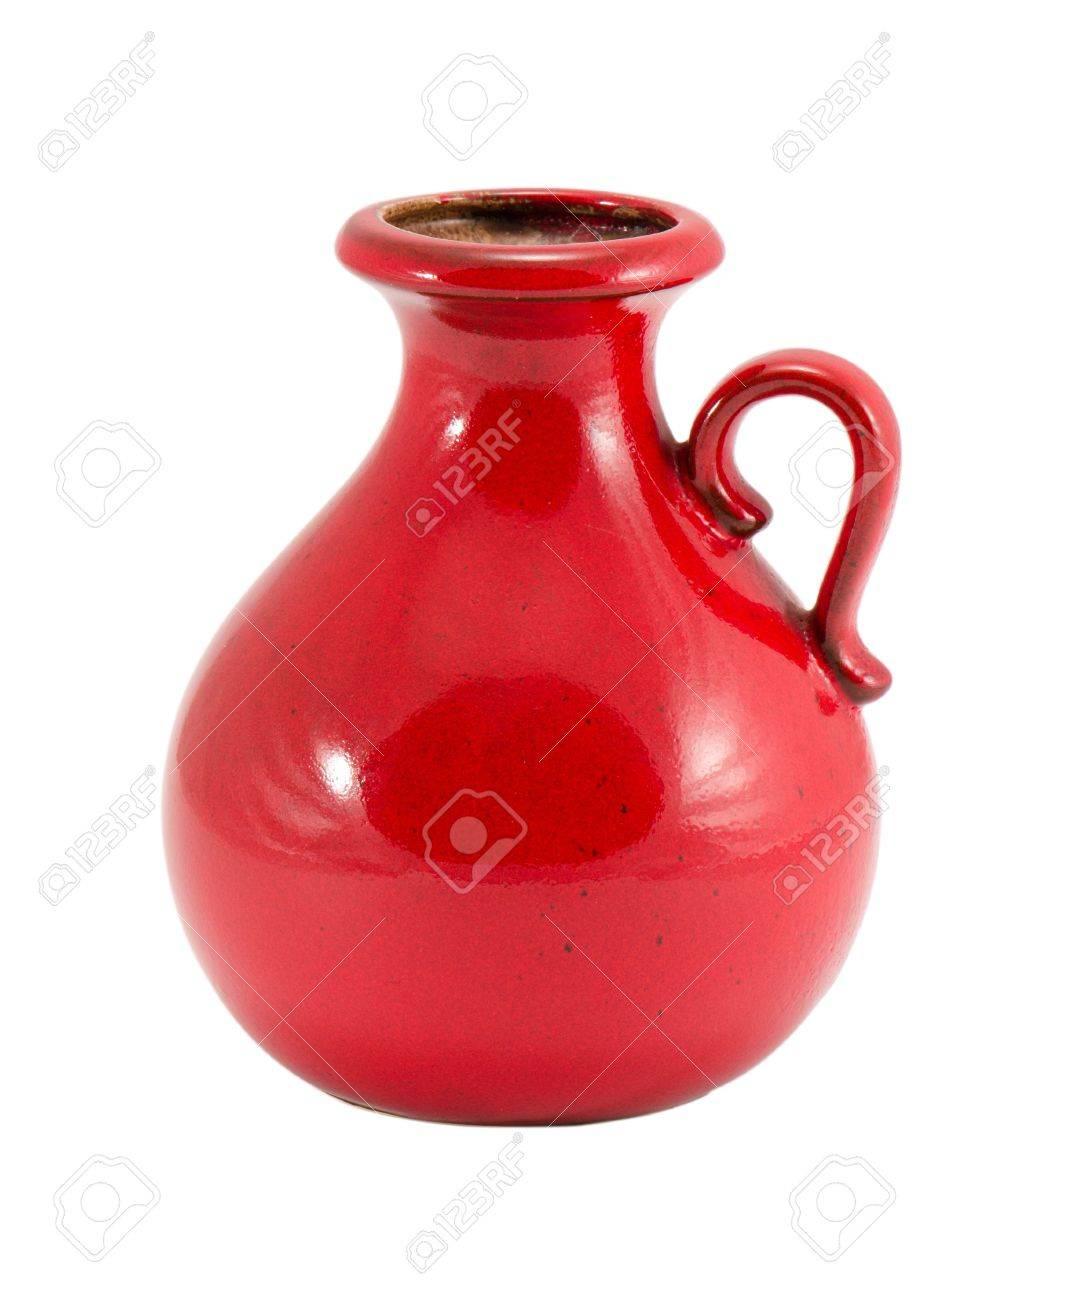 Red retro ceramic round flower vase with handle and small hole red retro ceramic round flower vase with handle and small hole isolated on white background stock reviewsmspy